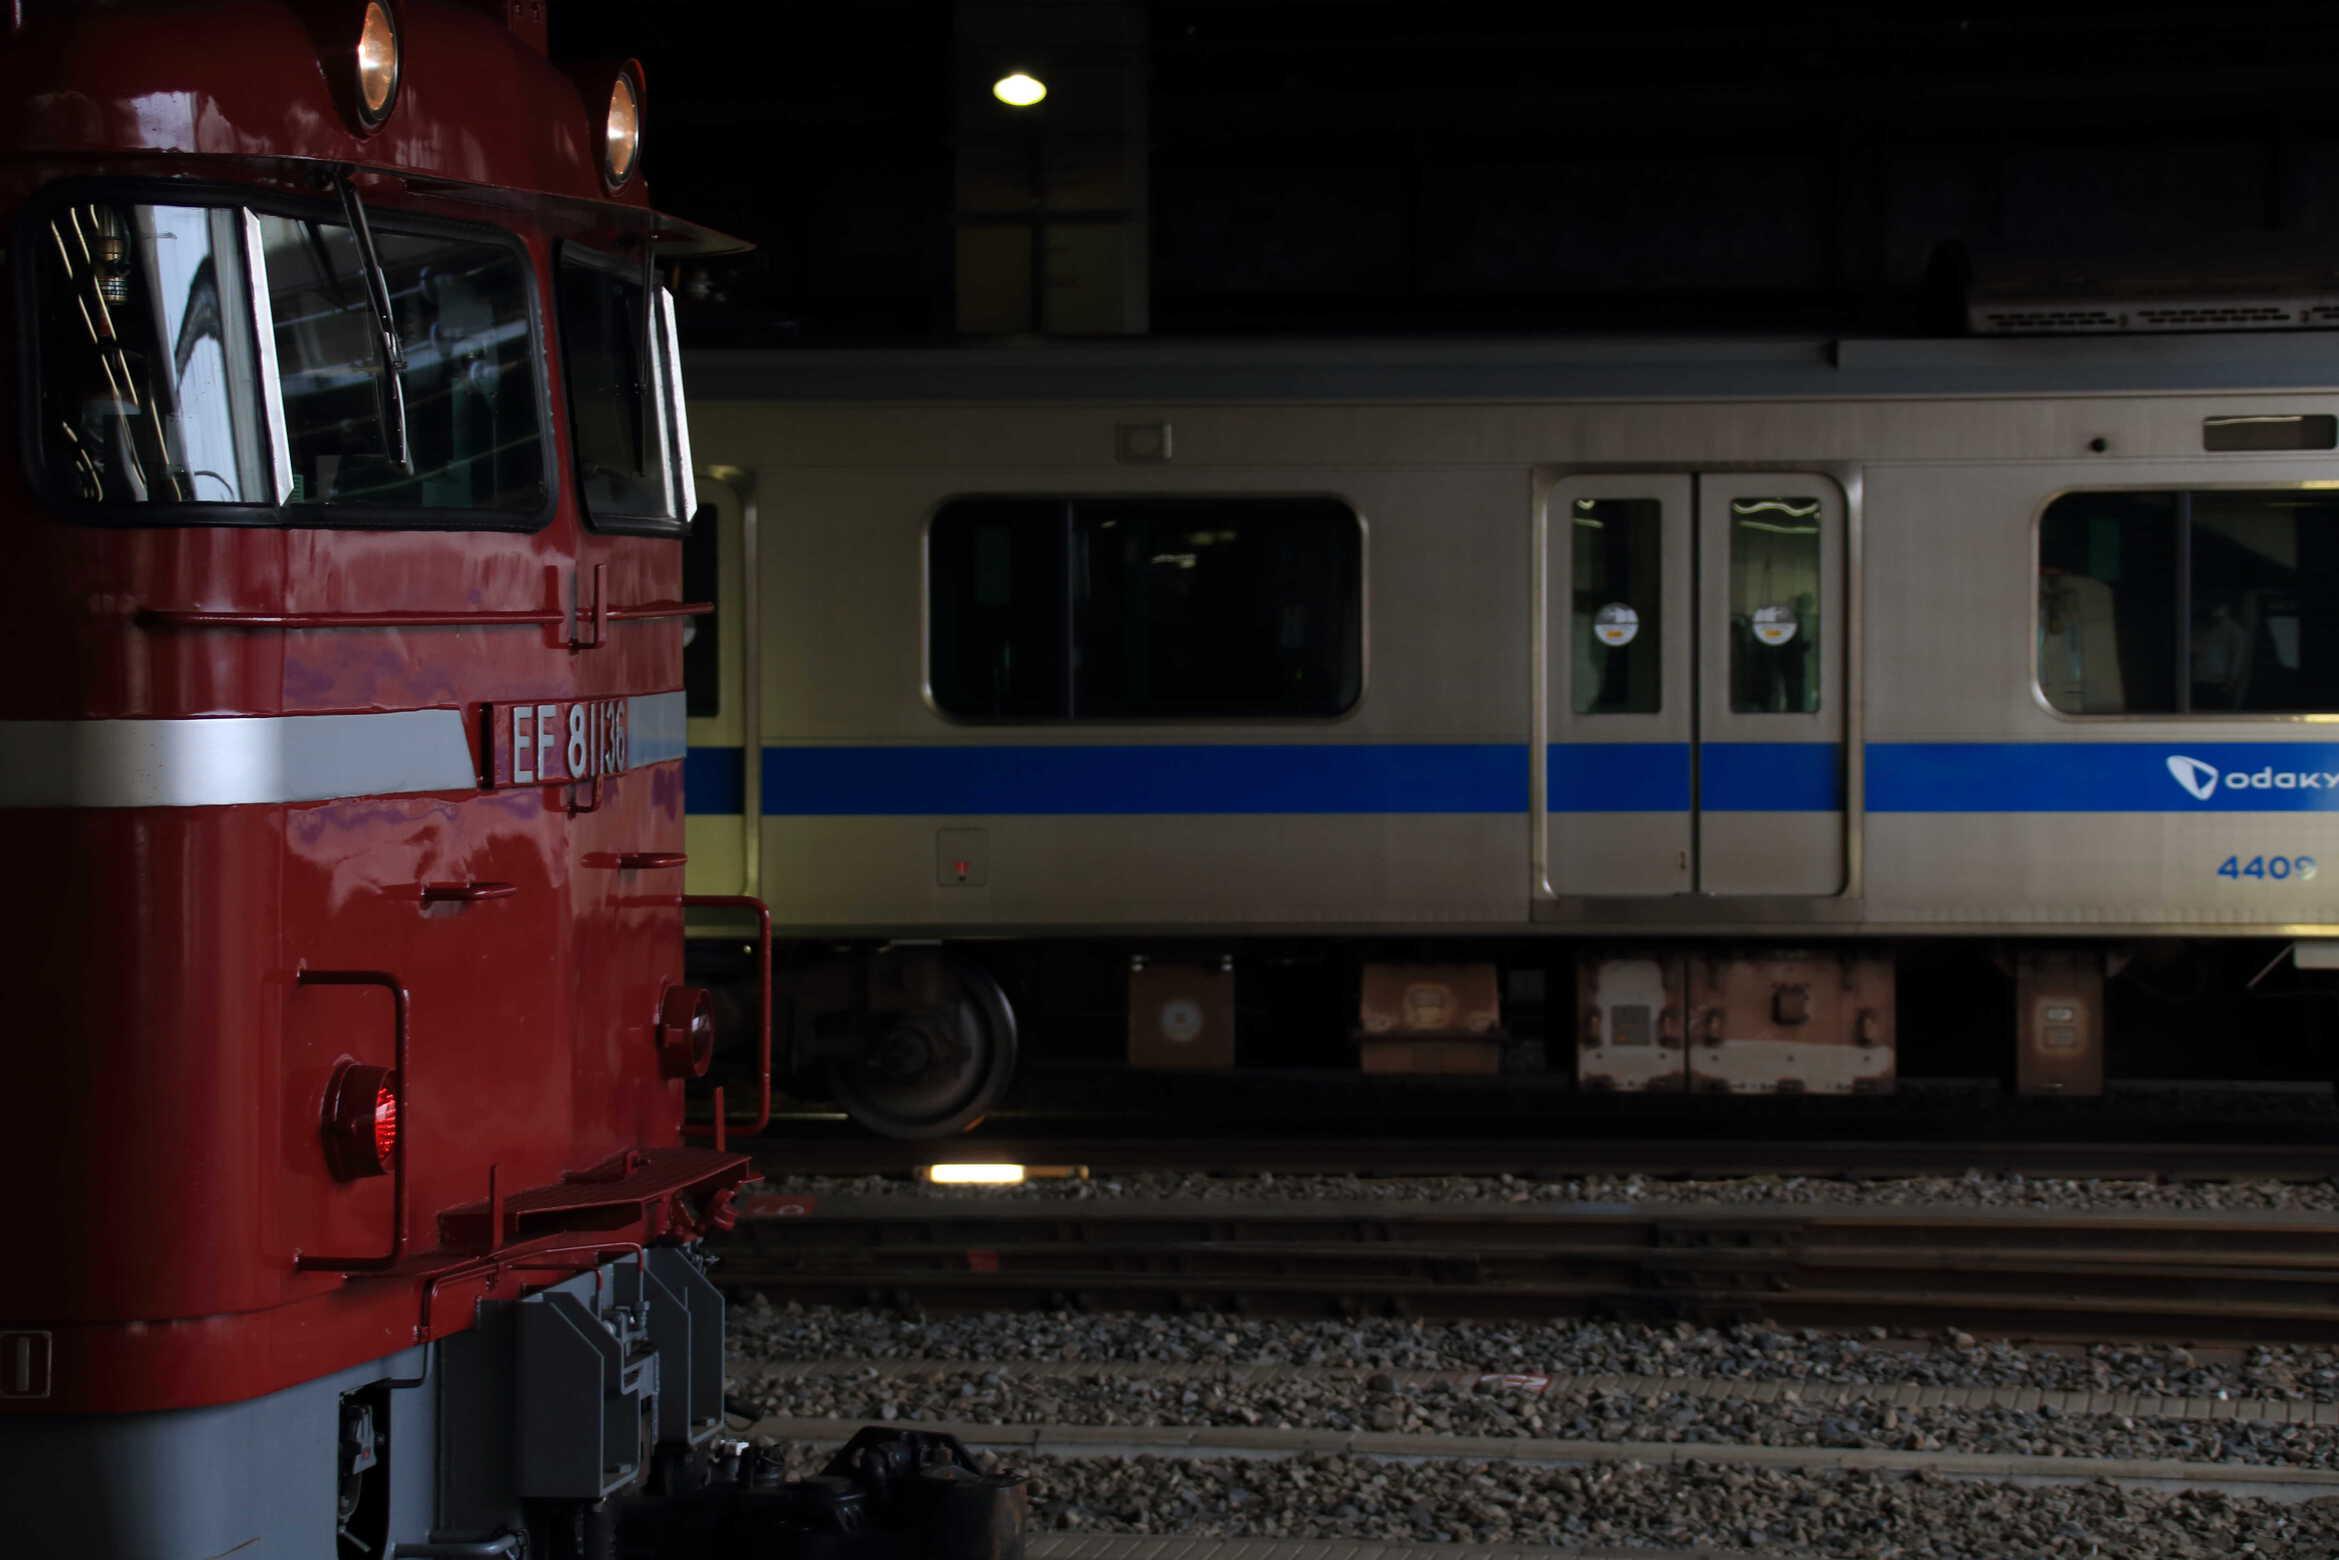 EF81-136